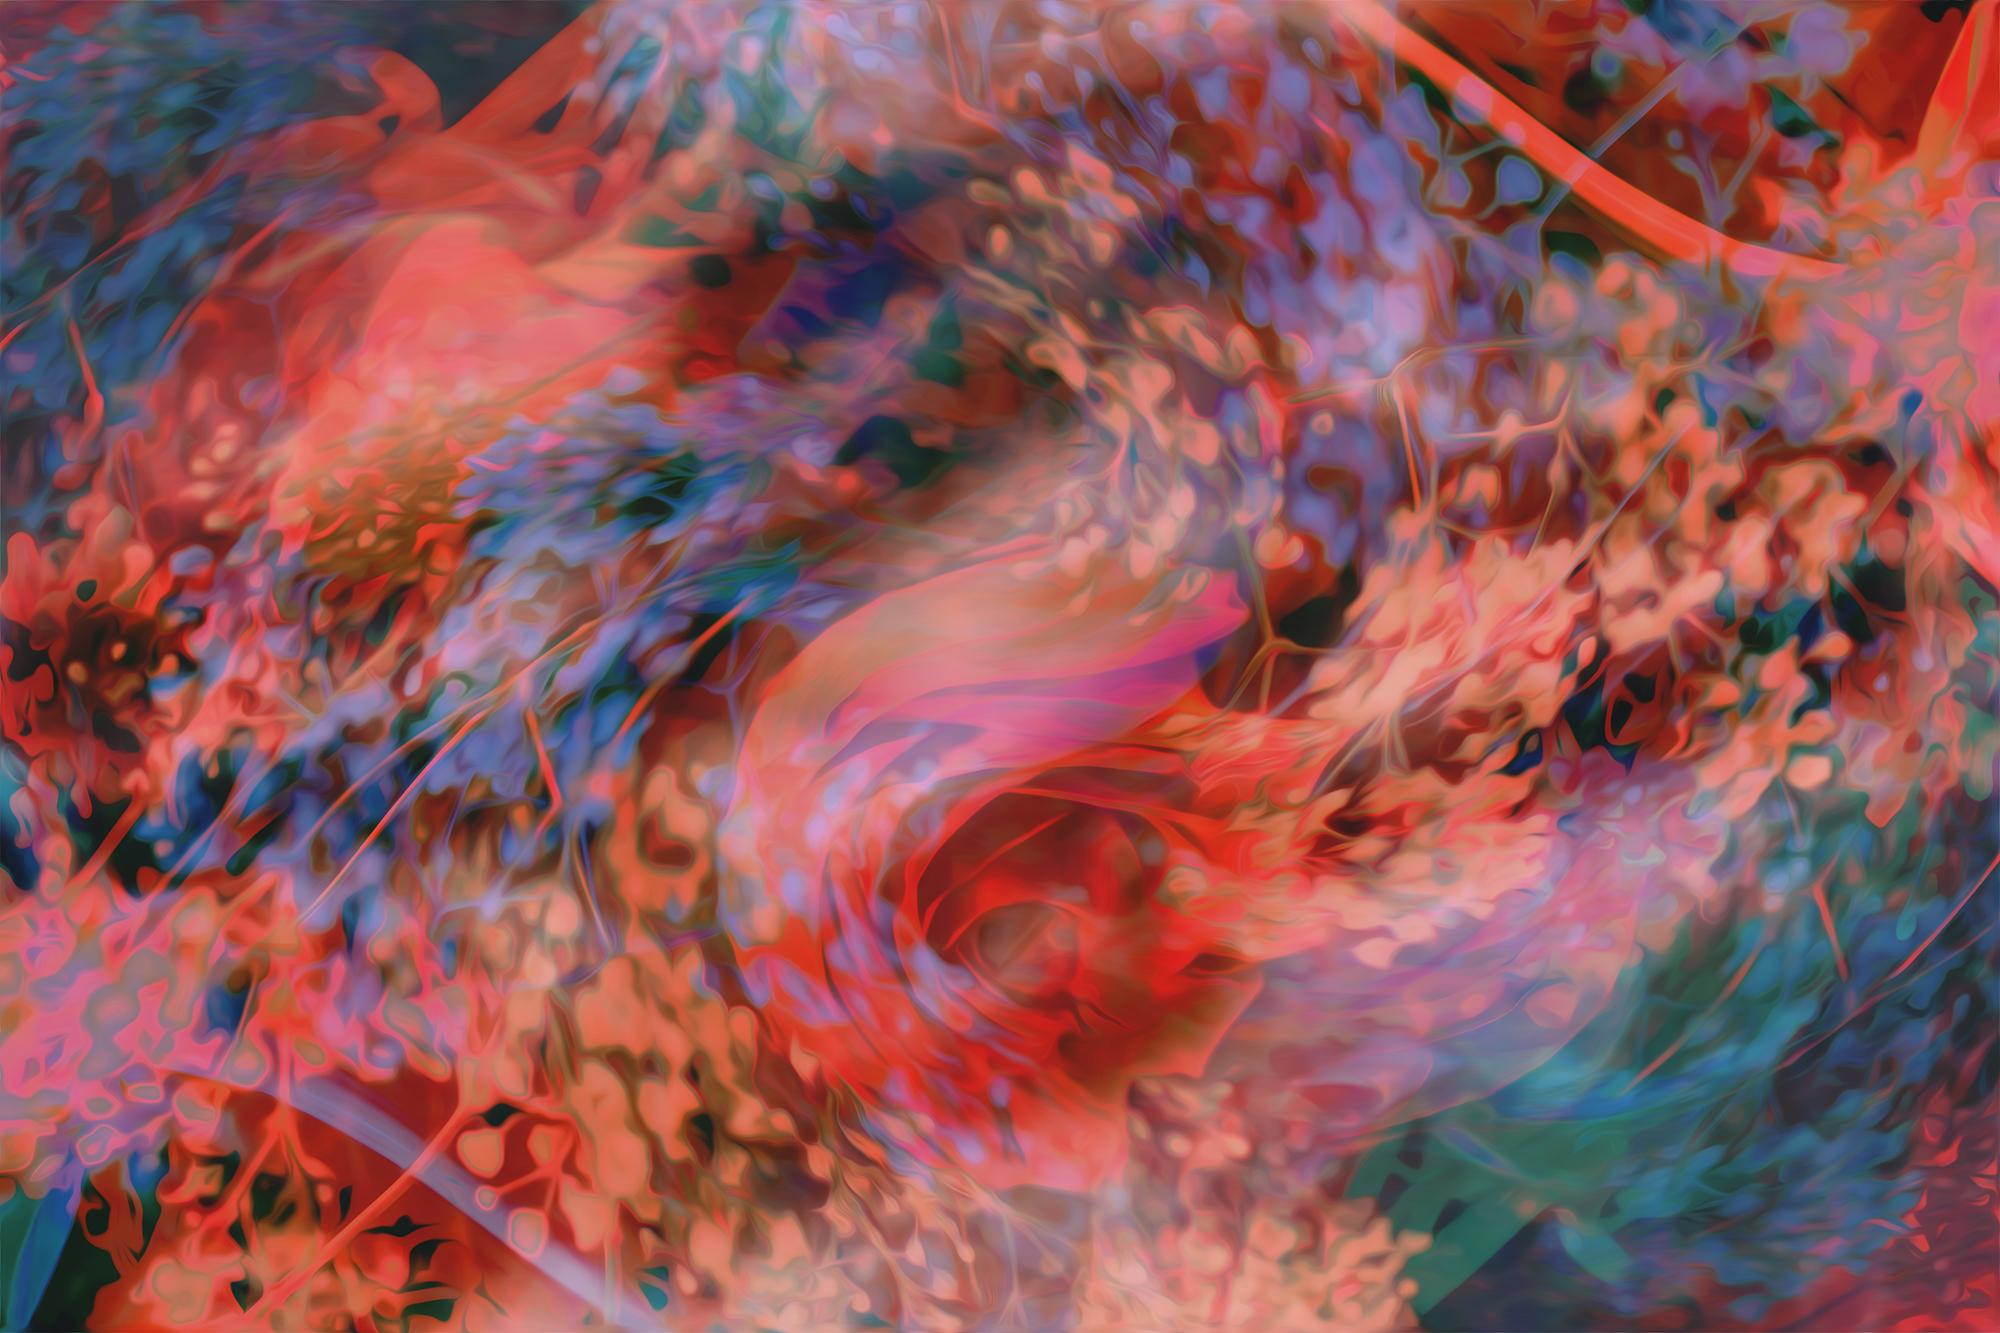 Silk , series 'Flower Daze' / The Girl Mirage @geenamatuson #thegirlmirage